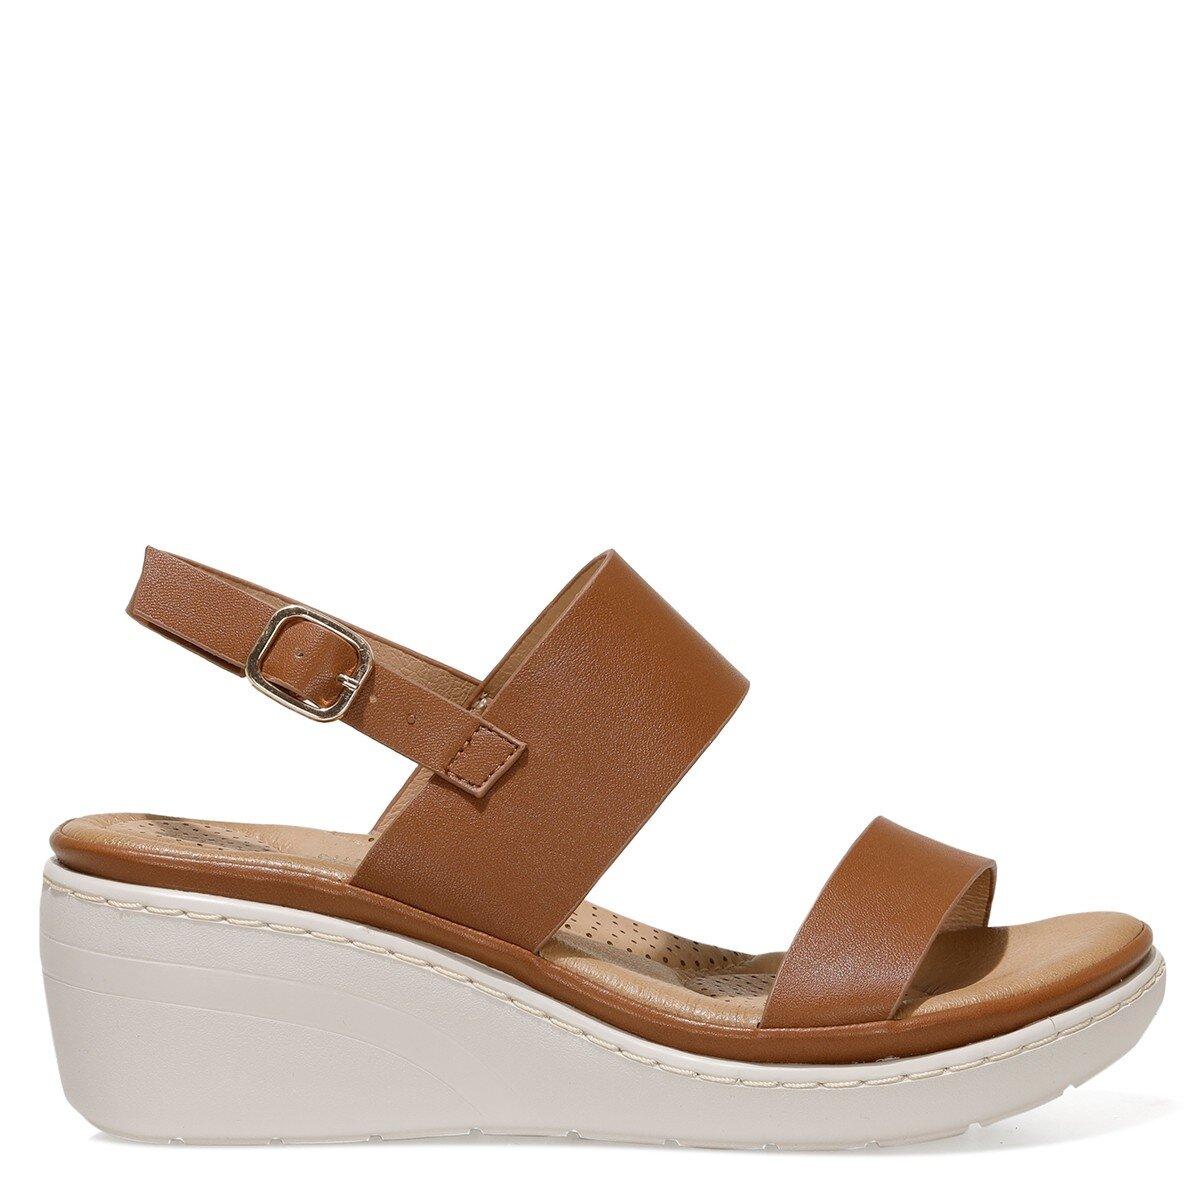 MAISIE 1FX Kahverengi Kadın Dolgu Topuklu Sandalet